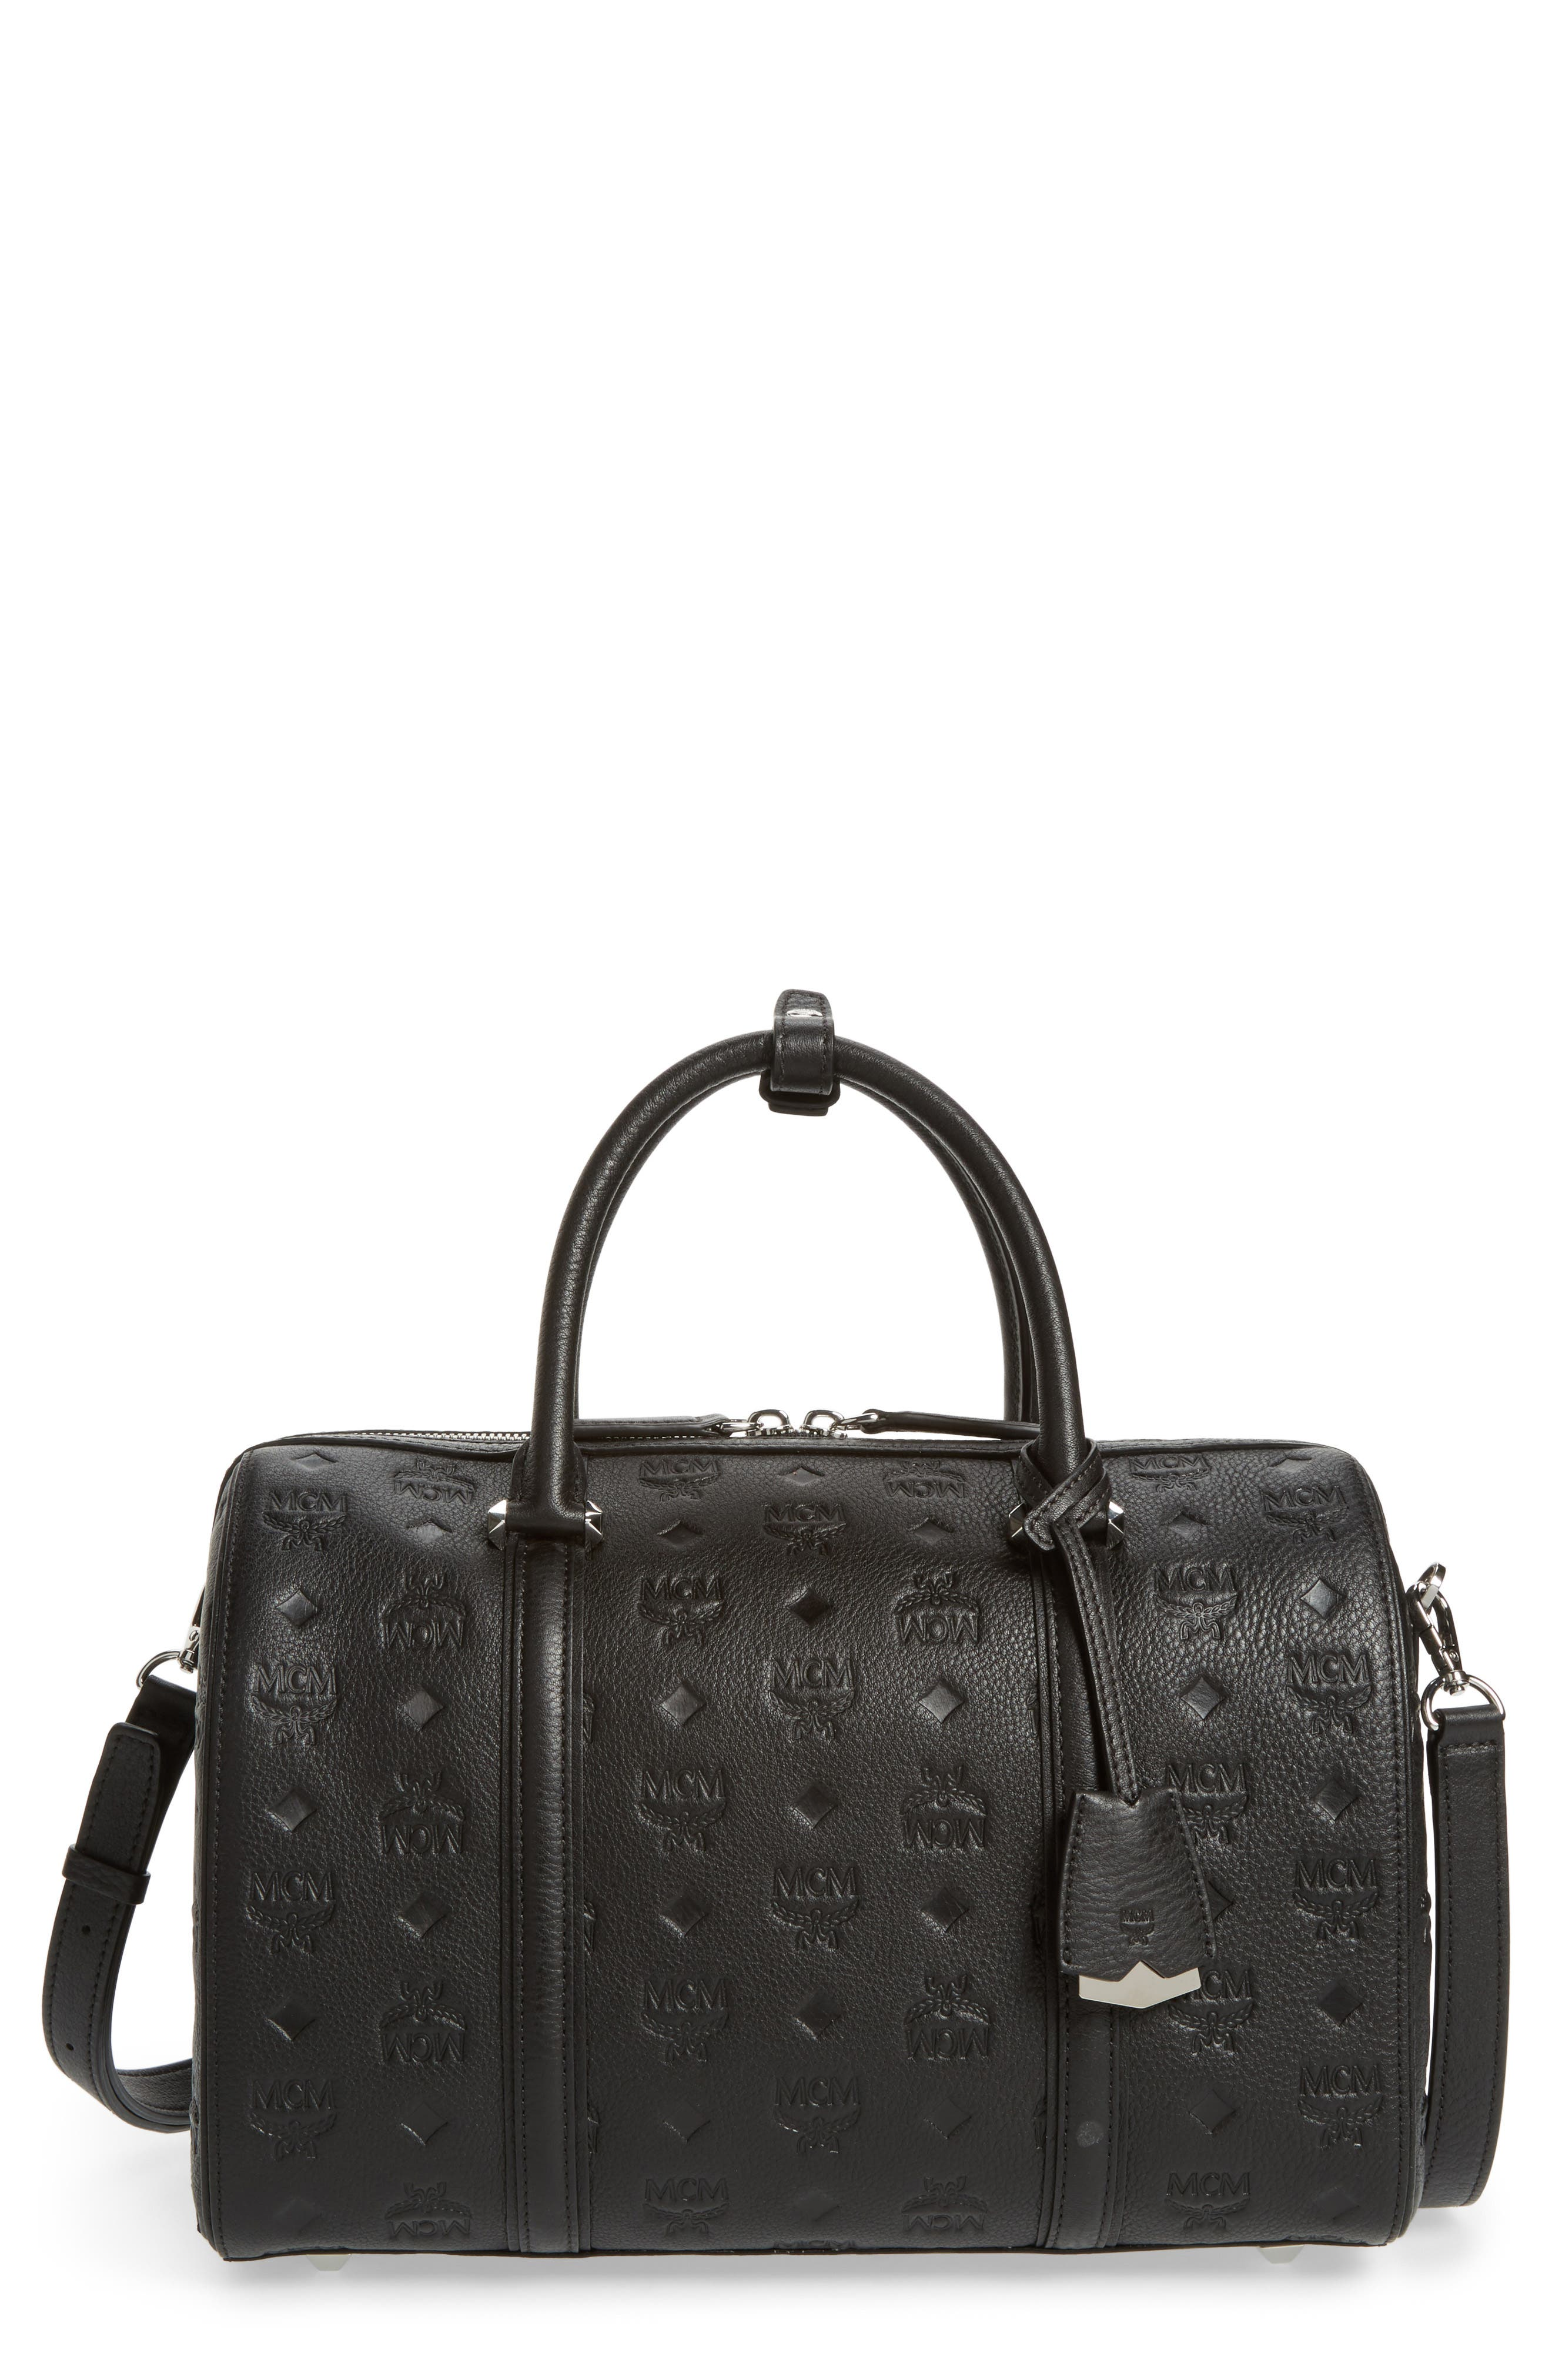 Signature Monogram Embossed Leather Crossbody Bag,                             Main thumbnail 1, color,                             001